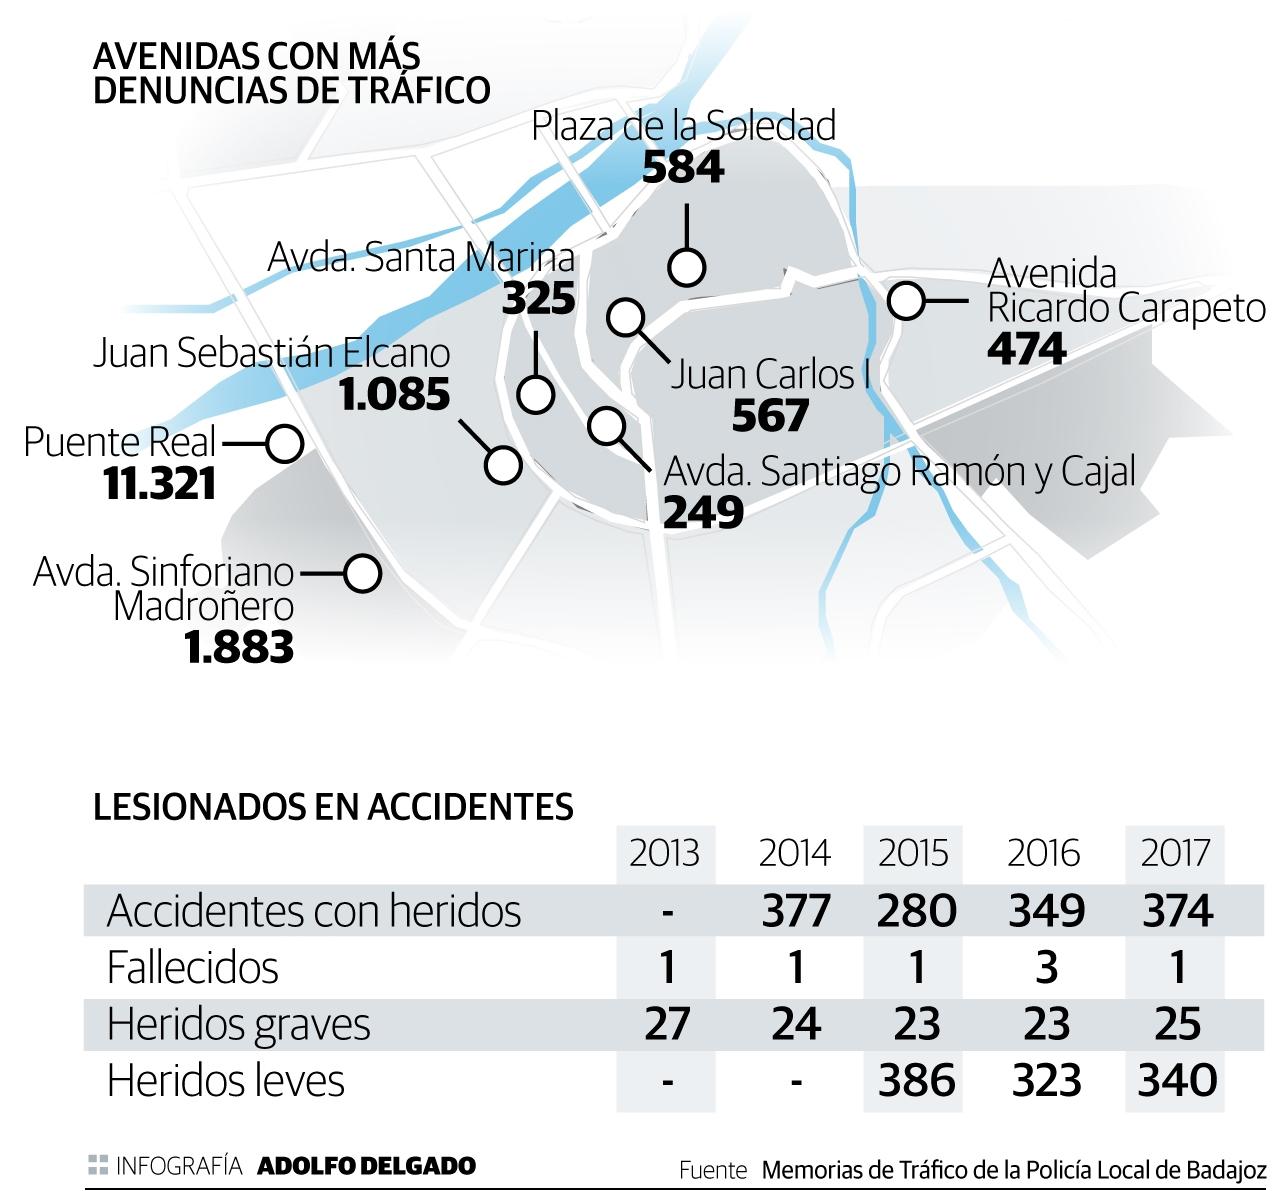 Avenidas de Badajoz con más denuncias de tráfico